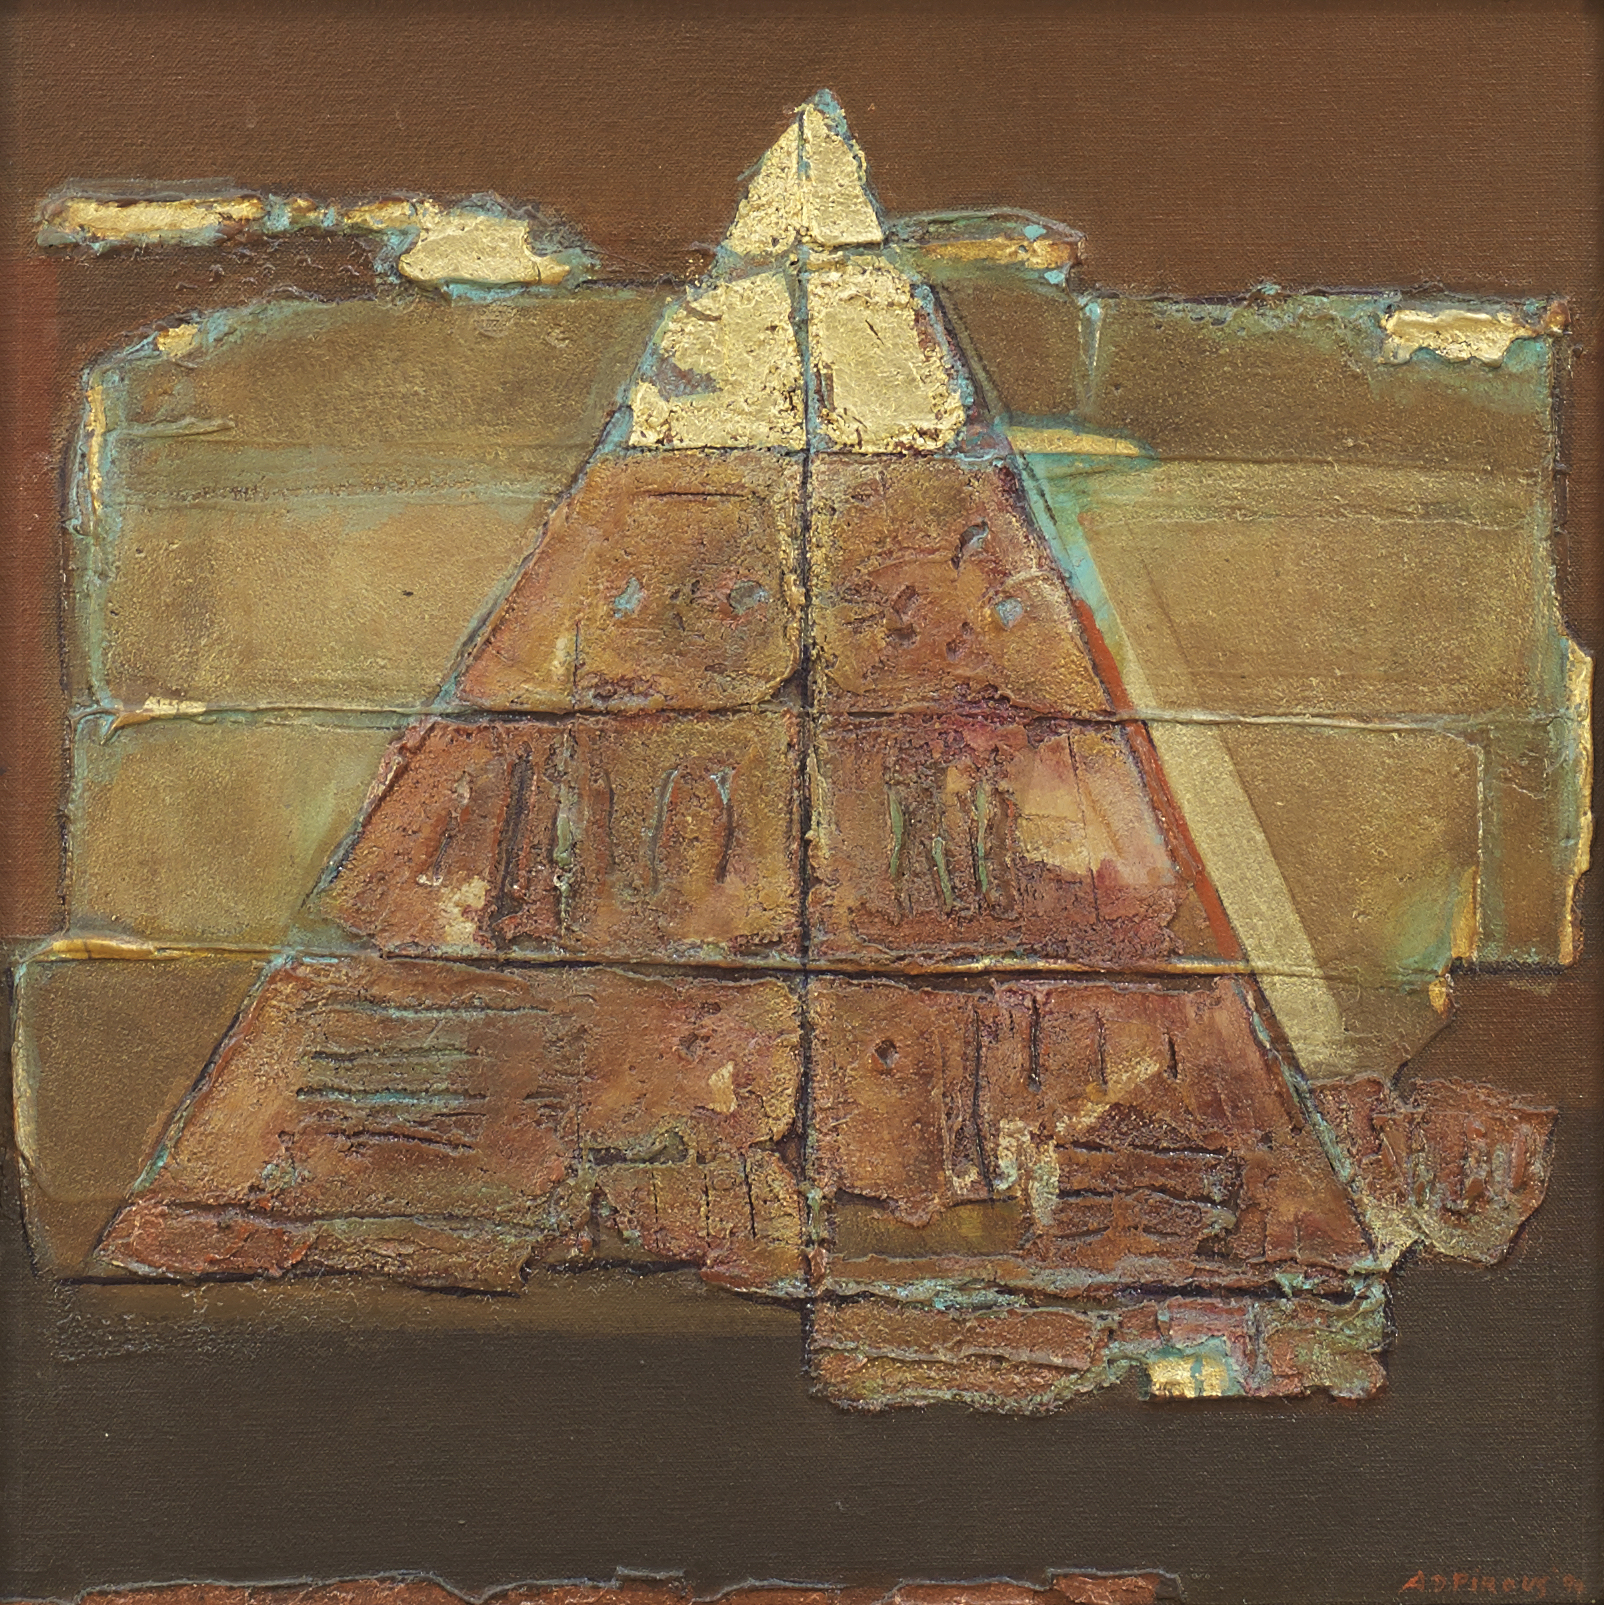 A.D. Pirous, Piramida Puncak Emas, 1994, oil on canvas, 40 x 40 cm